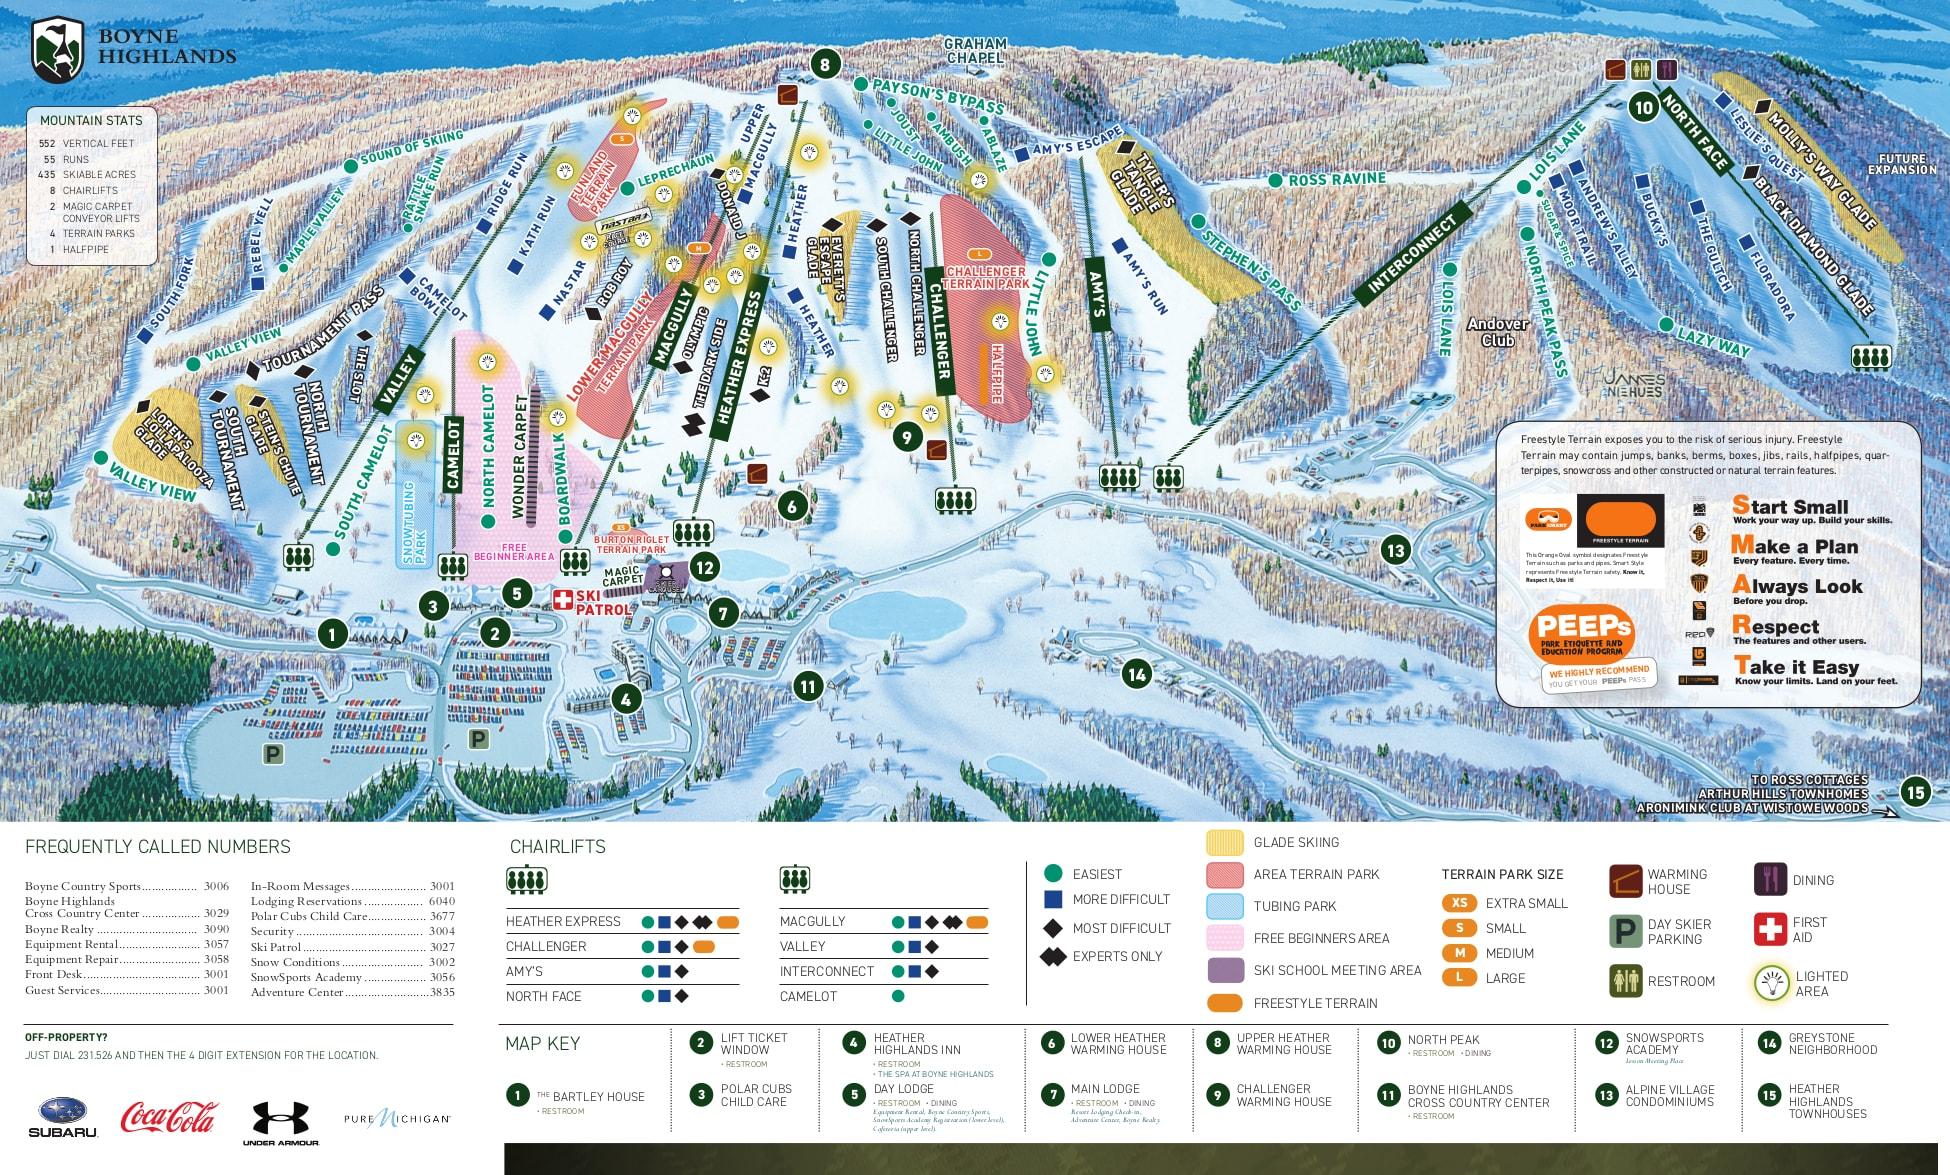 Boyne Highlands Ski Trail Map Free Download